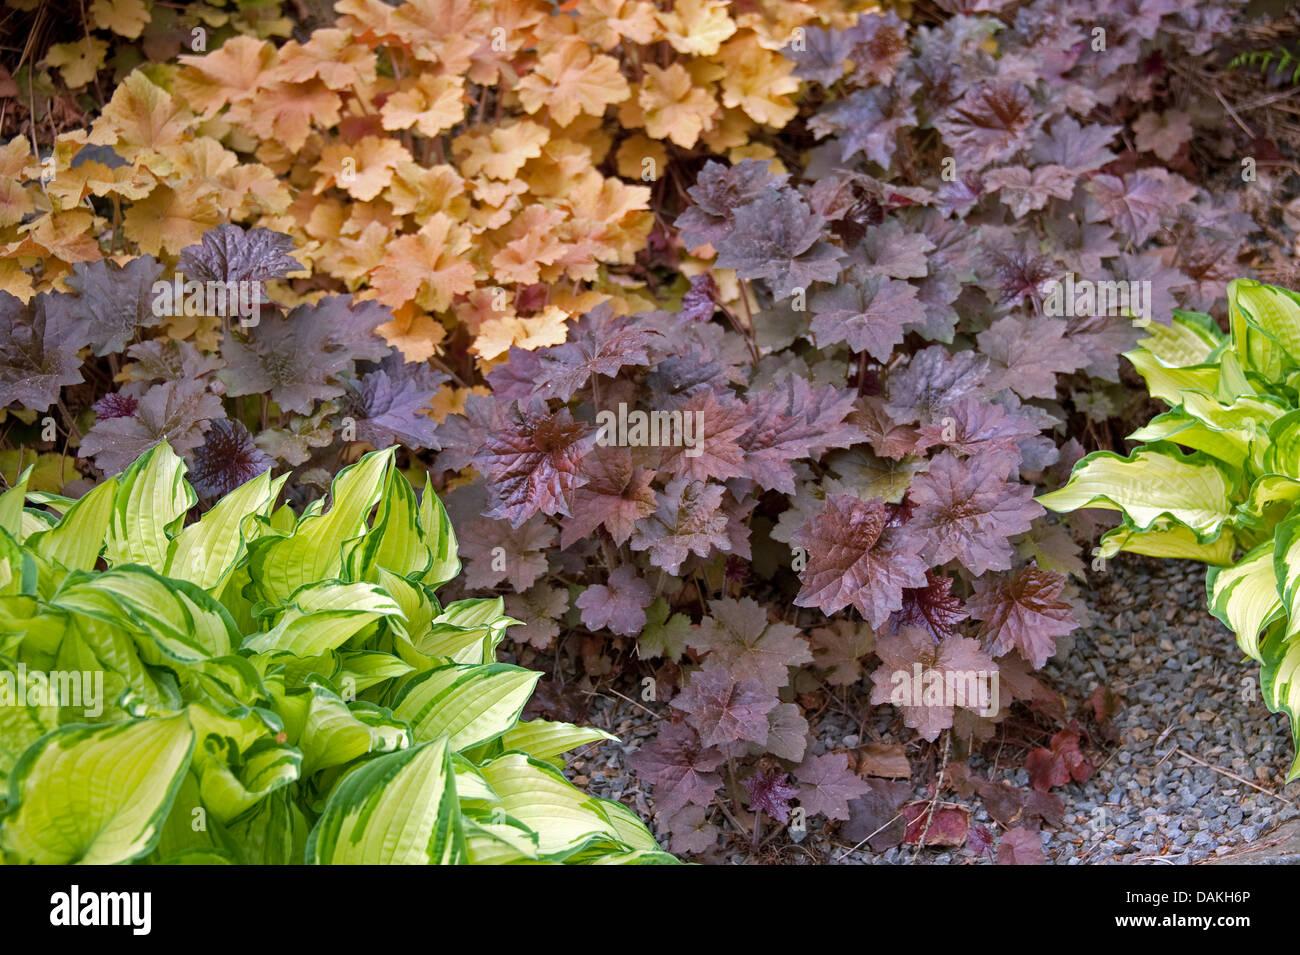 Heuchera  (Heuchera 'Palace Purple', Heuchera Palace Purple), cultivar Palace Purple - Stock Image